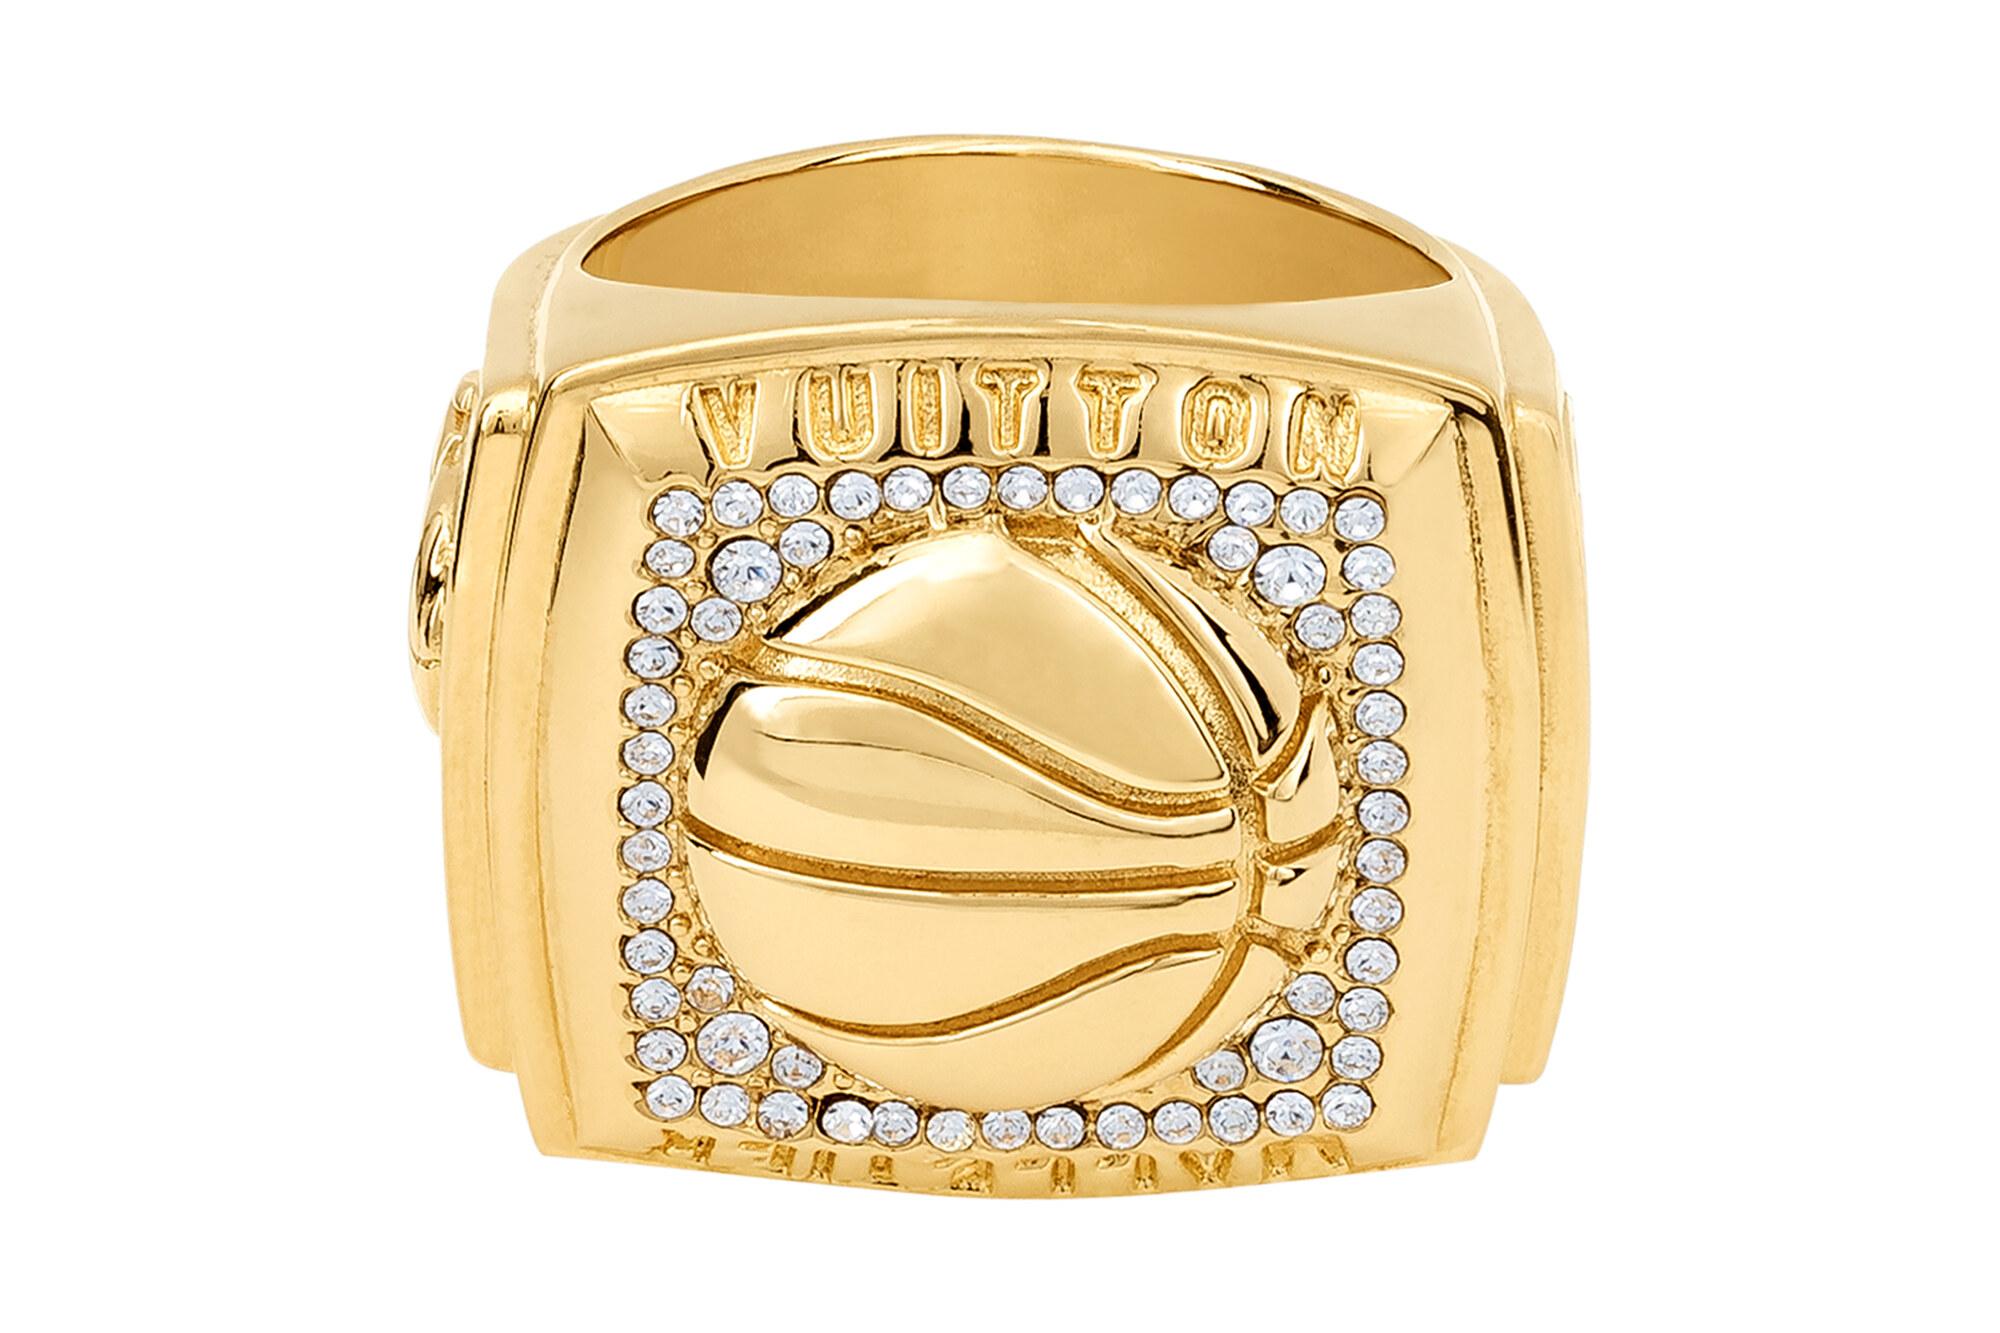 Louis Vuitton x NBA Ring